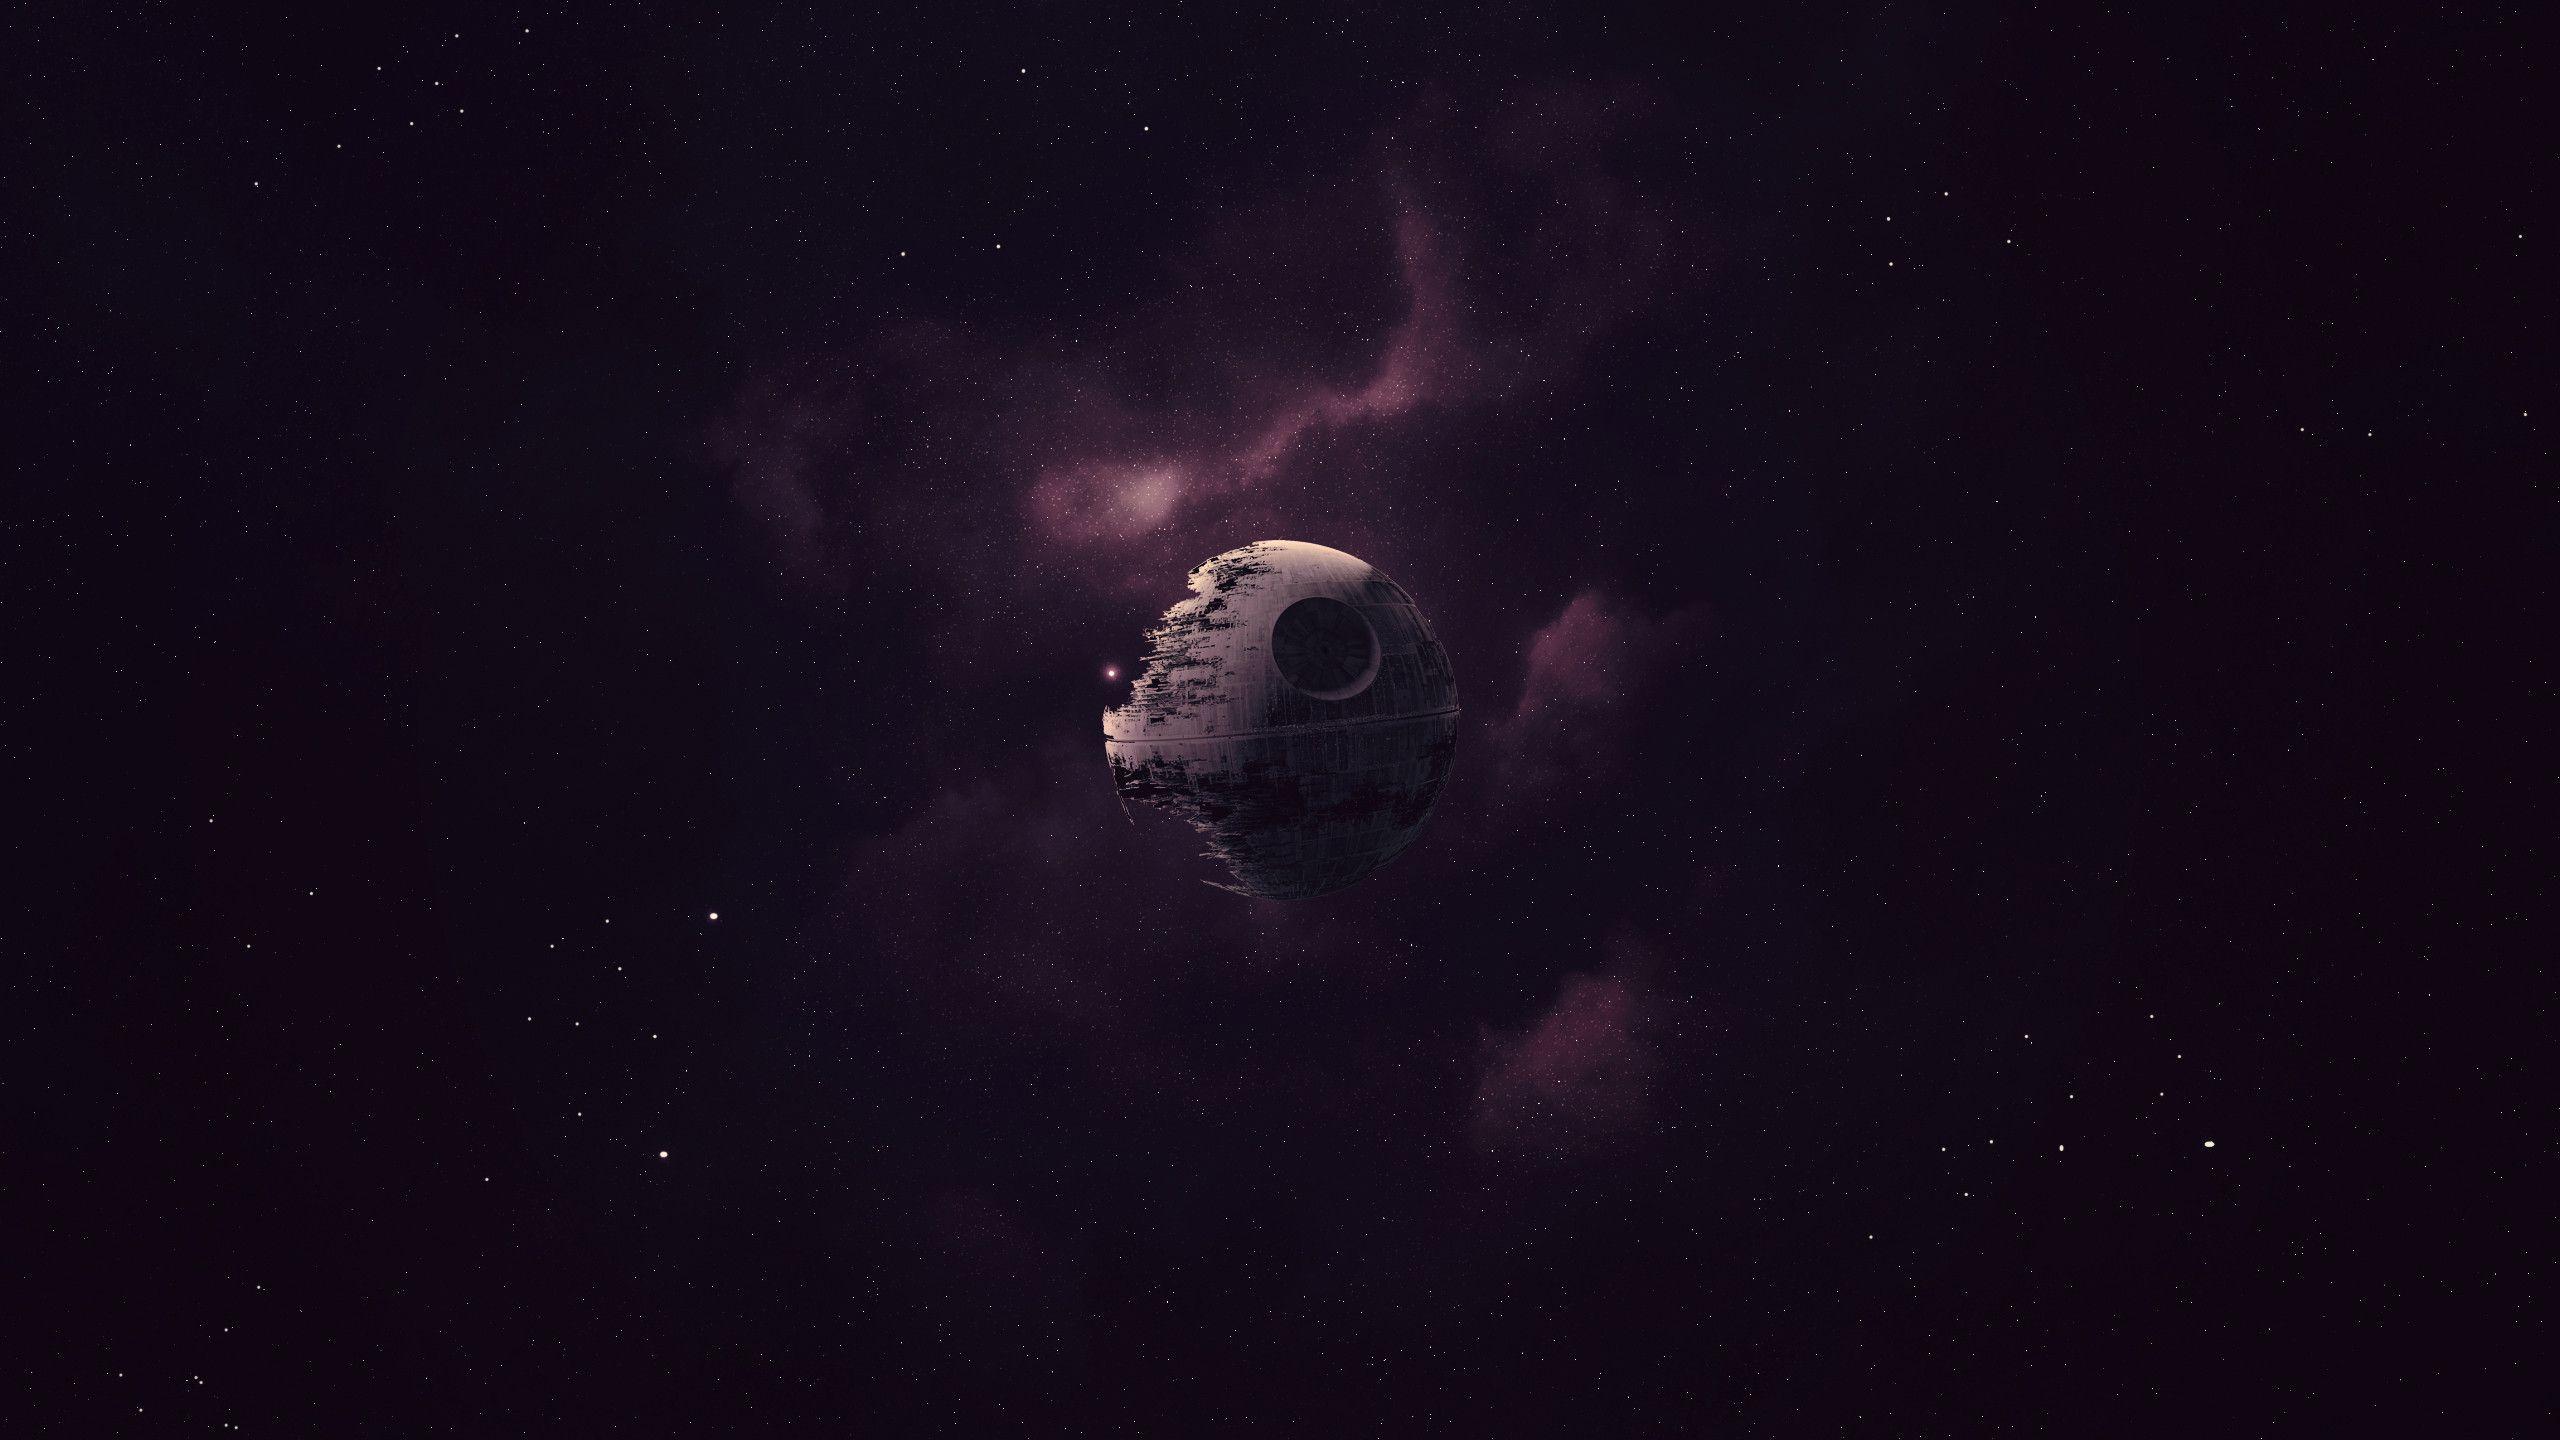 Gothic Fall Wallpaper Free Death Star Backgrounds Download Pixelstalk Net